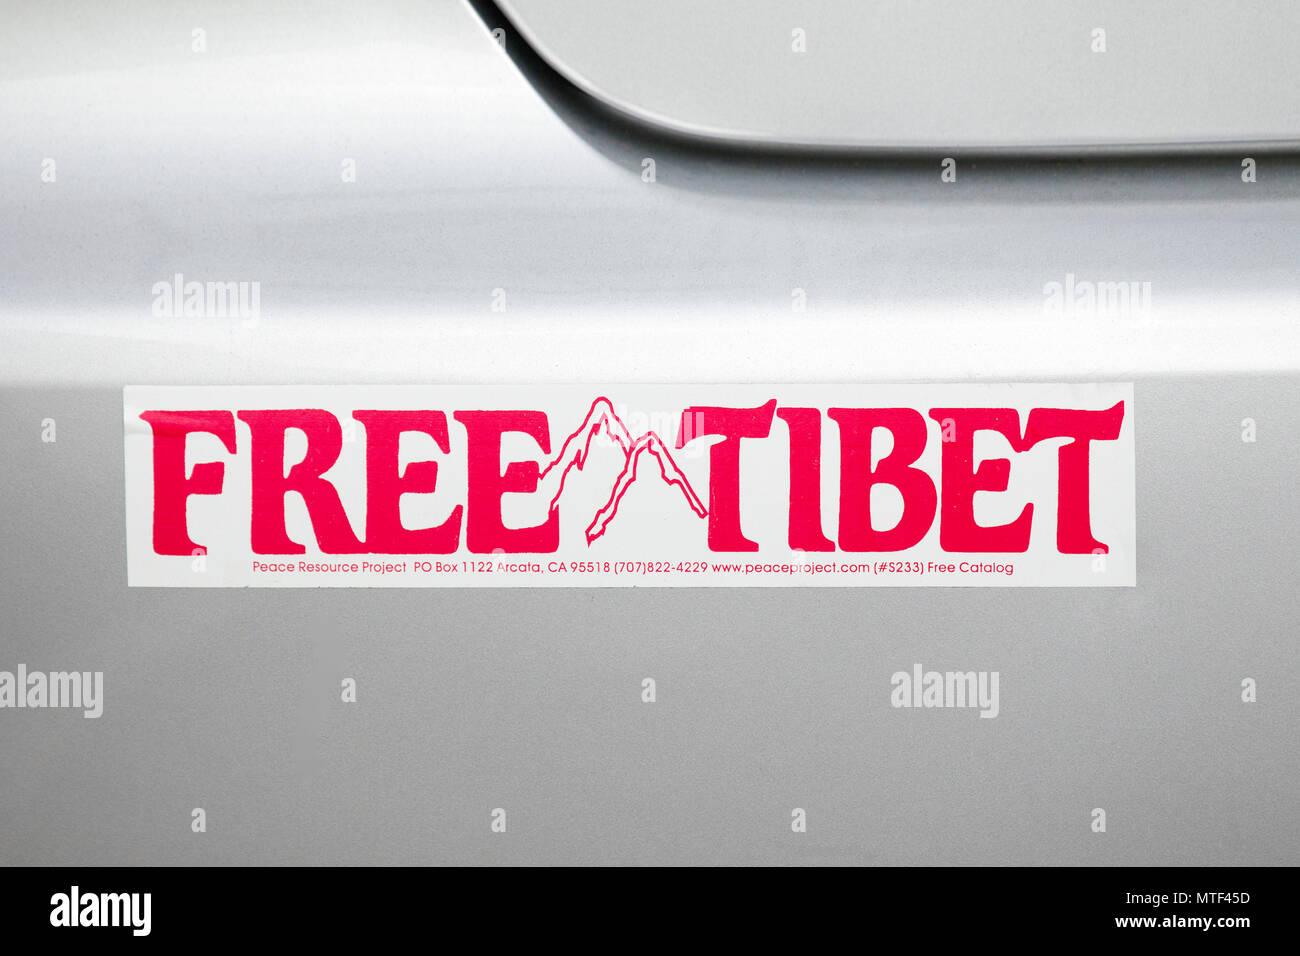 Free tibet bumper sticker stock image